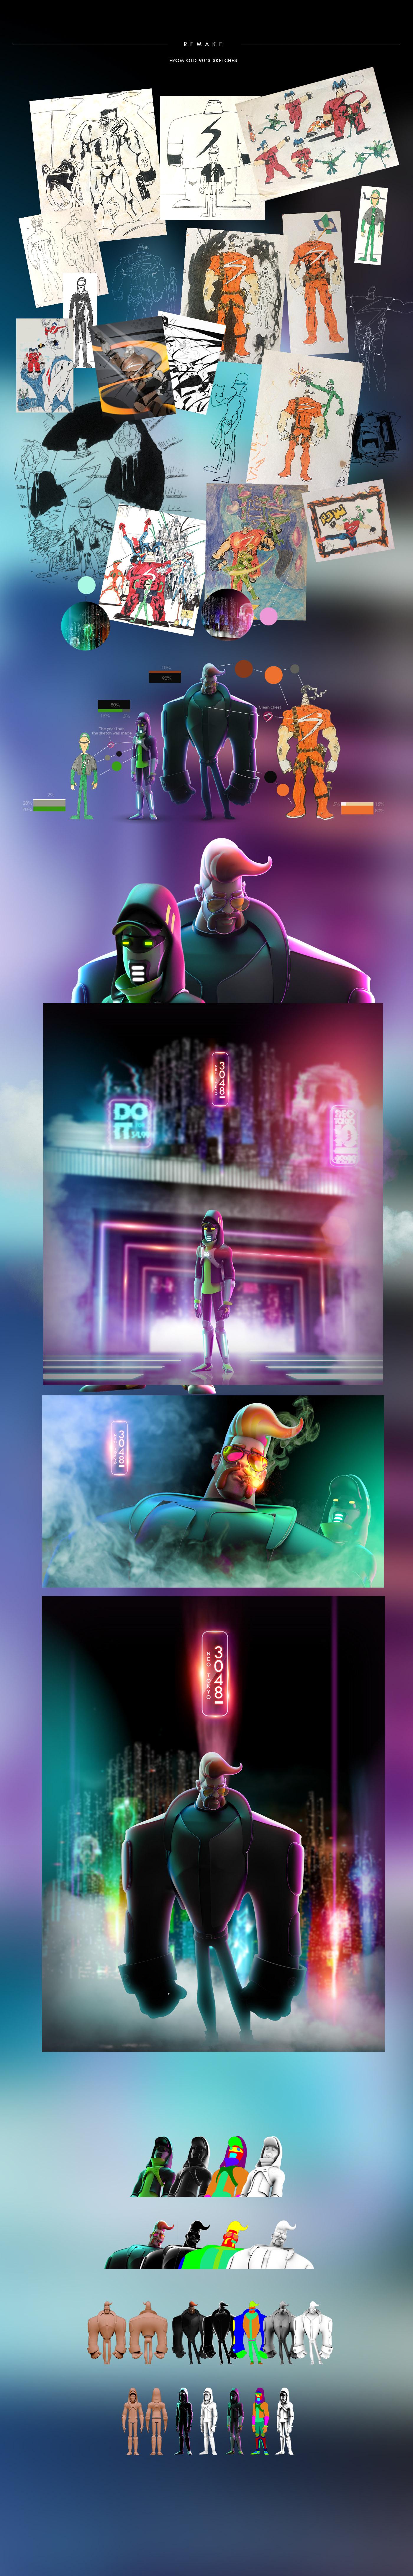 Image may contain: dance, screenshot and cartoon